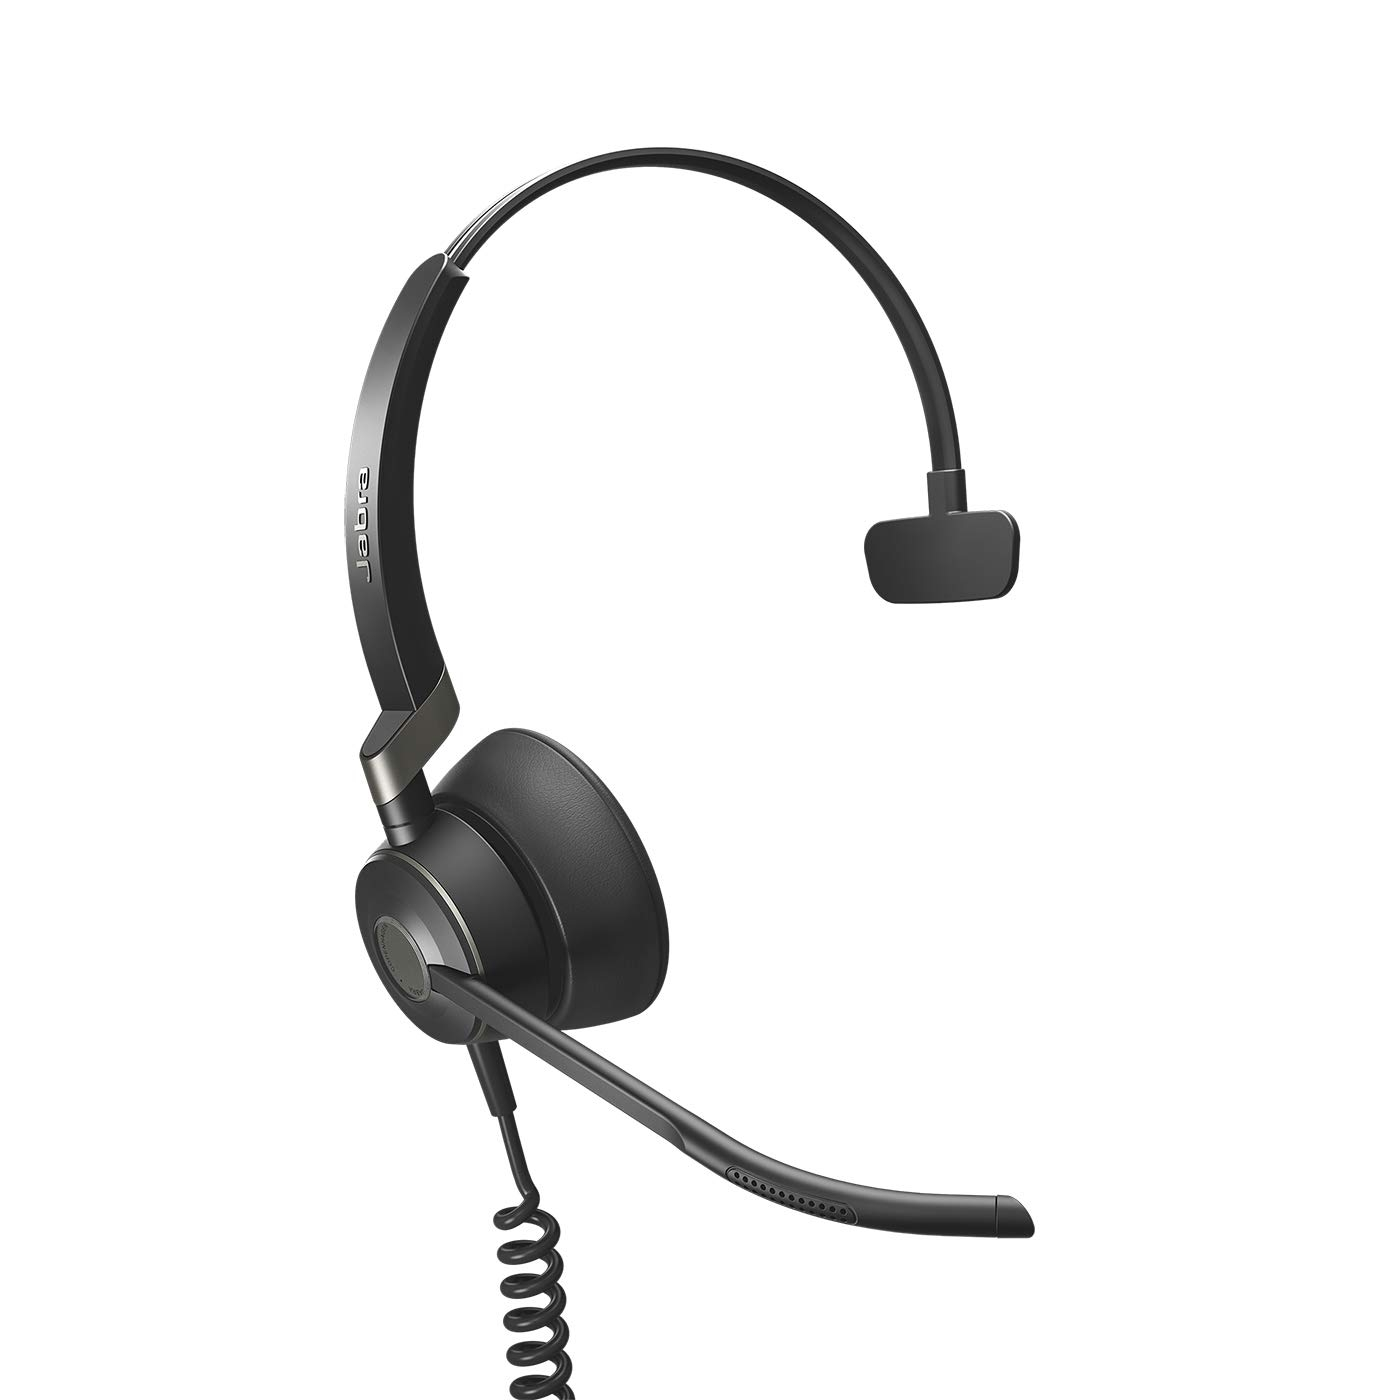 Image of Jabra Engage 50 Mono Corded Headset for USB-C